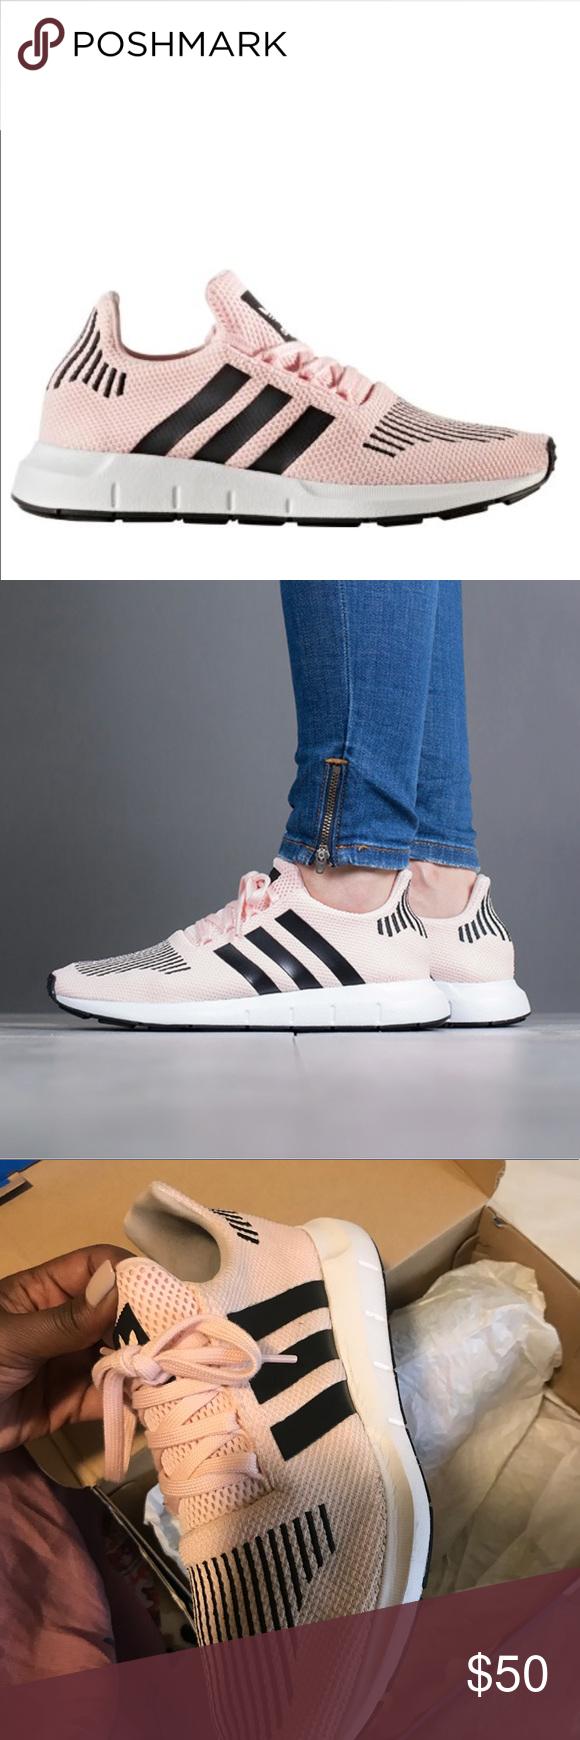 adidas swift run luce rosa swift, adidas e le adidas